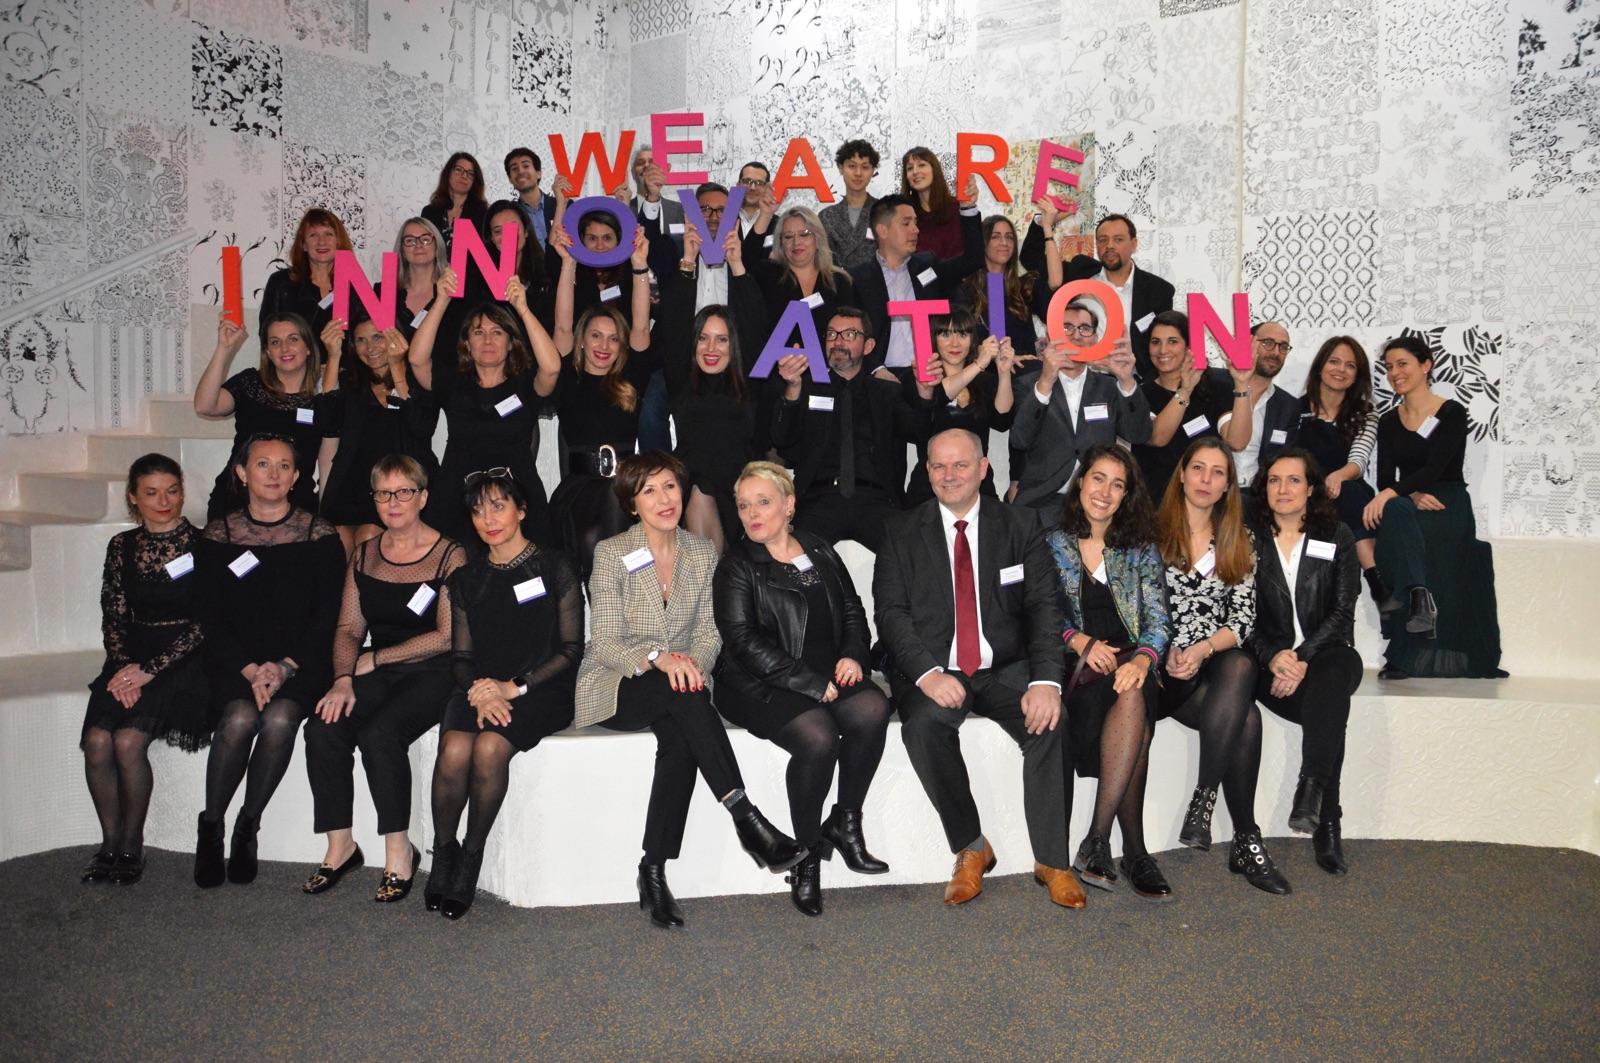 campagne we are innovation, communication, galeries lafayette, usinage de lettrage, remise des prix, make it marseille